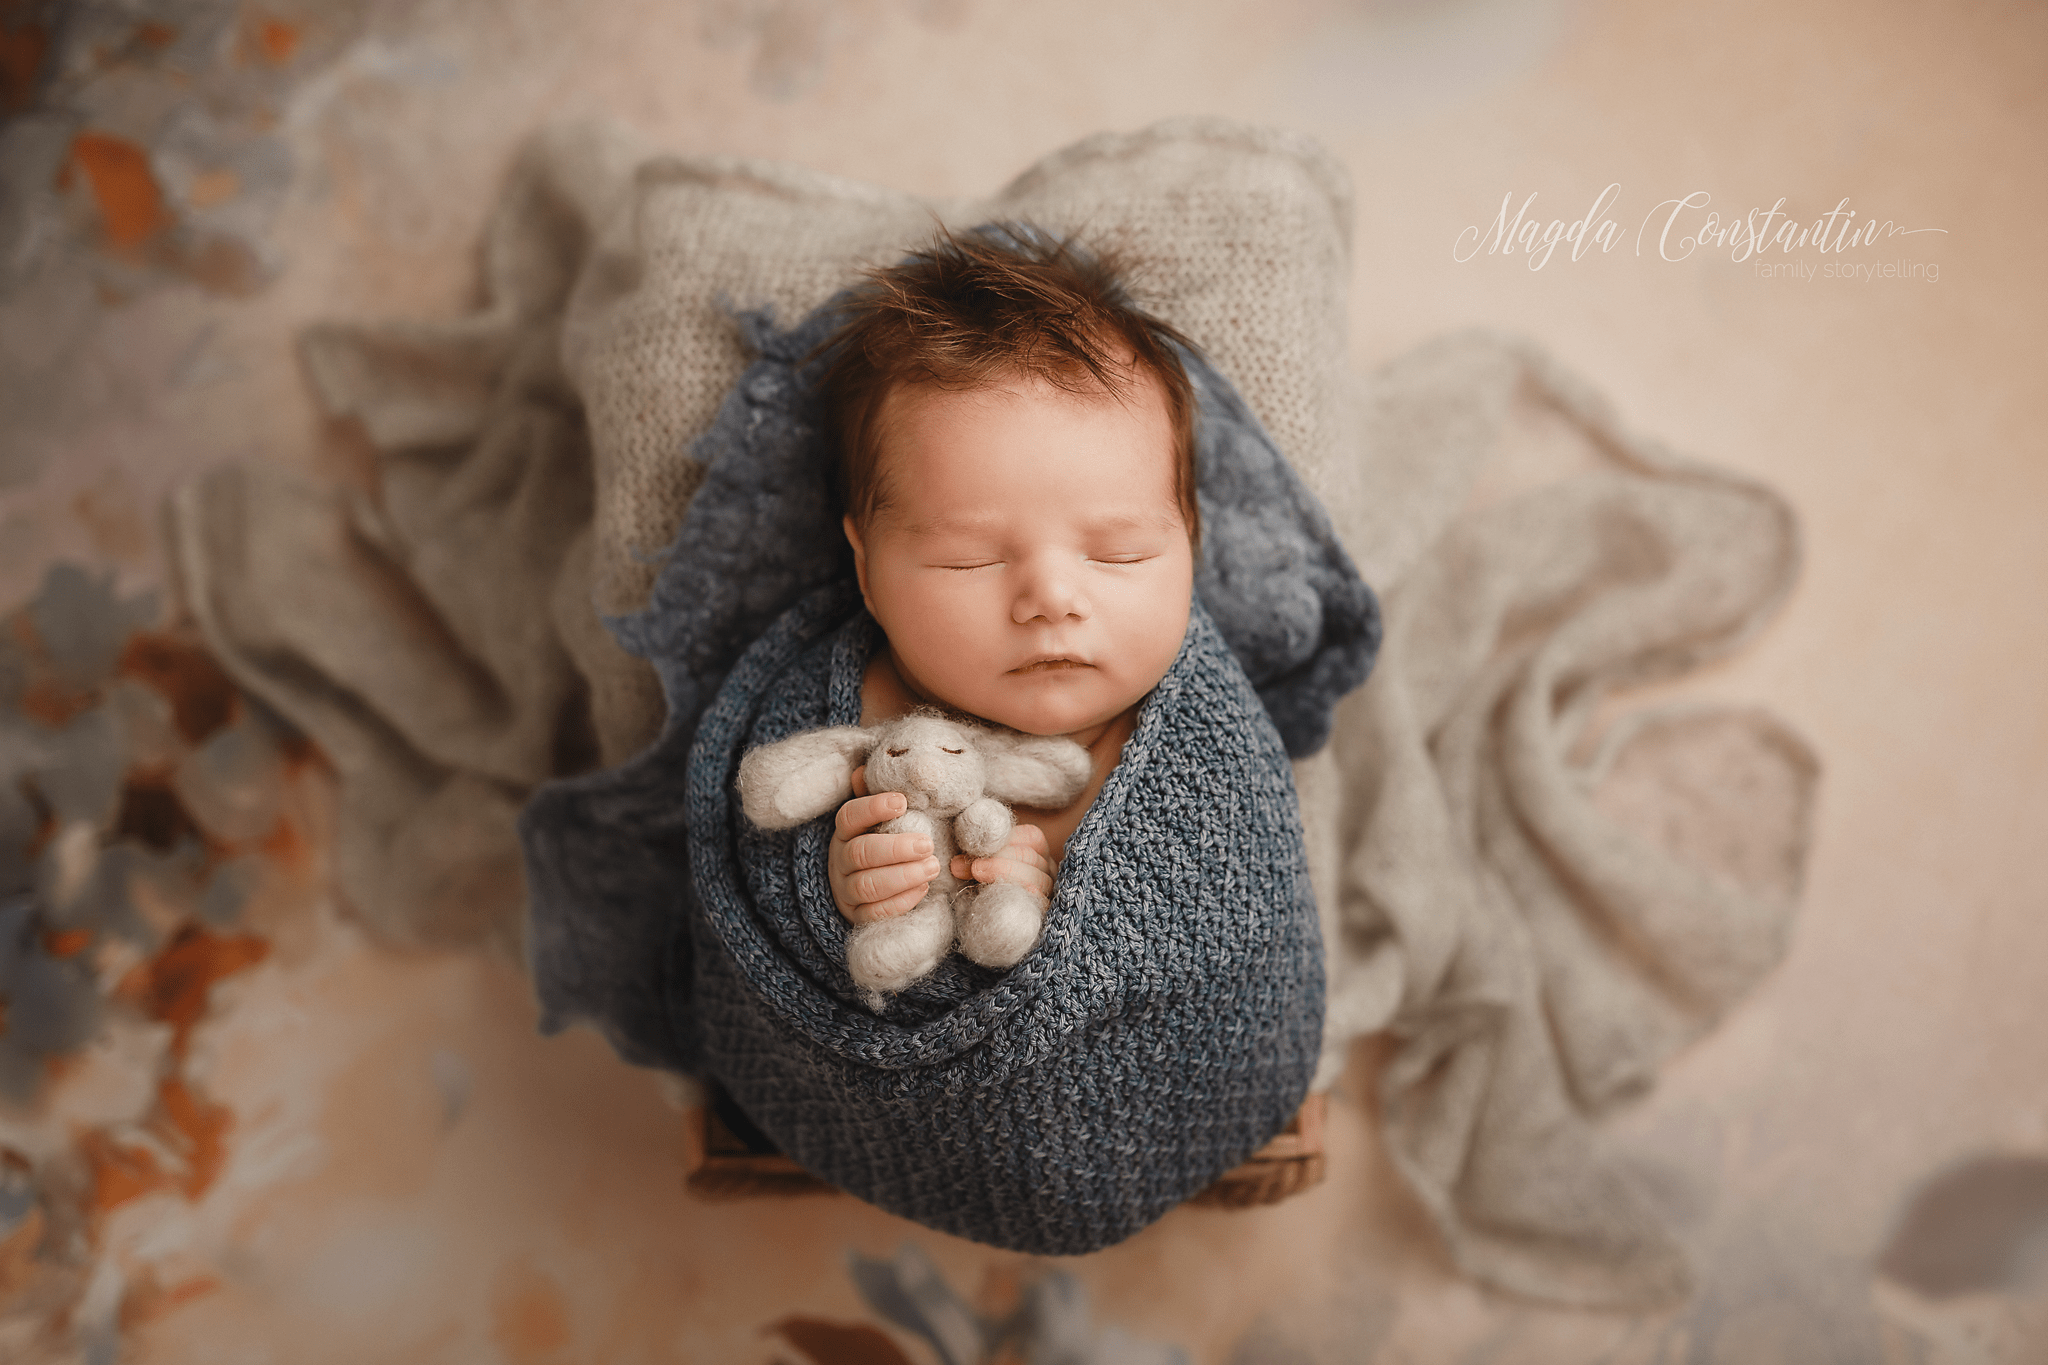 Sedinta foto de nou nascut in Bucuresti Magda Constantin